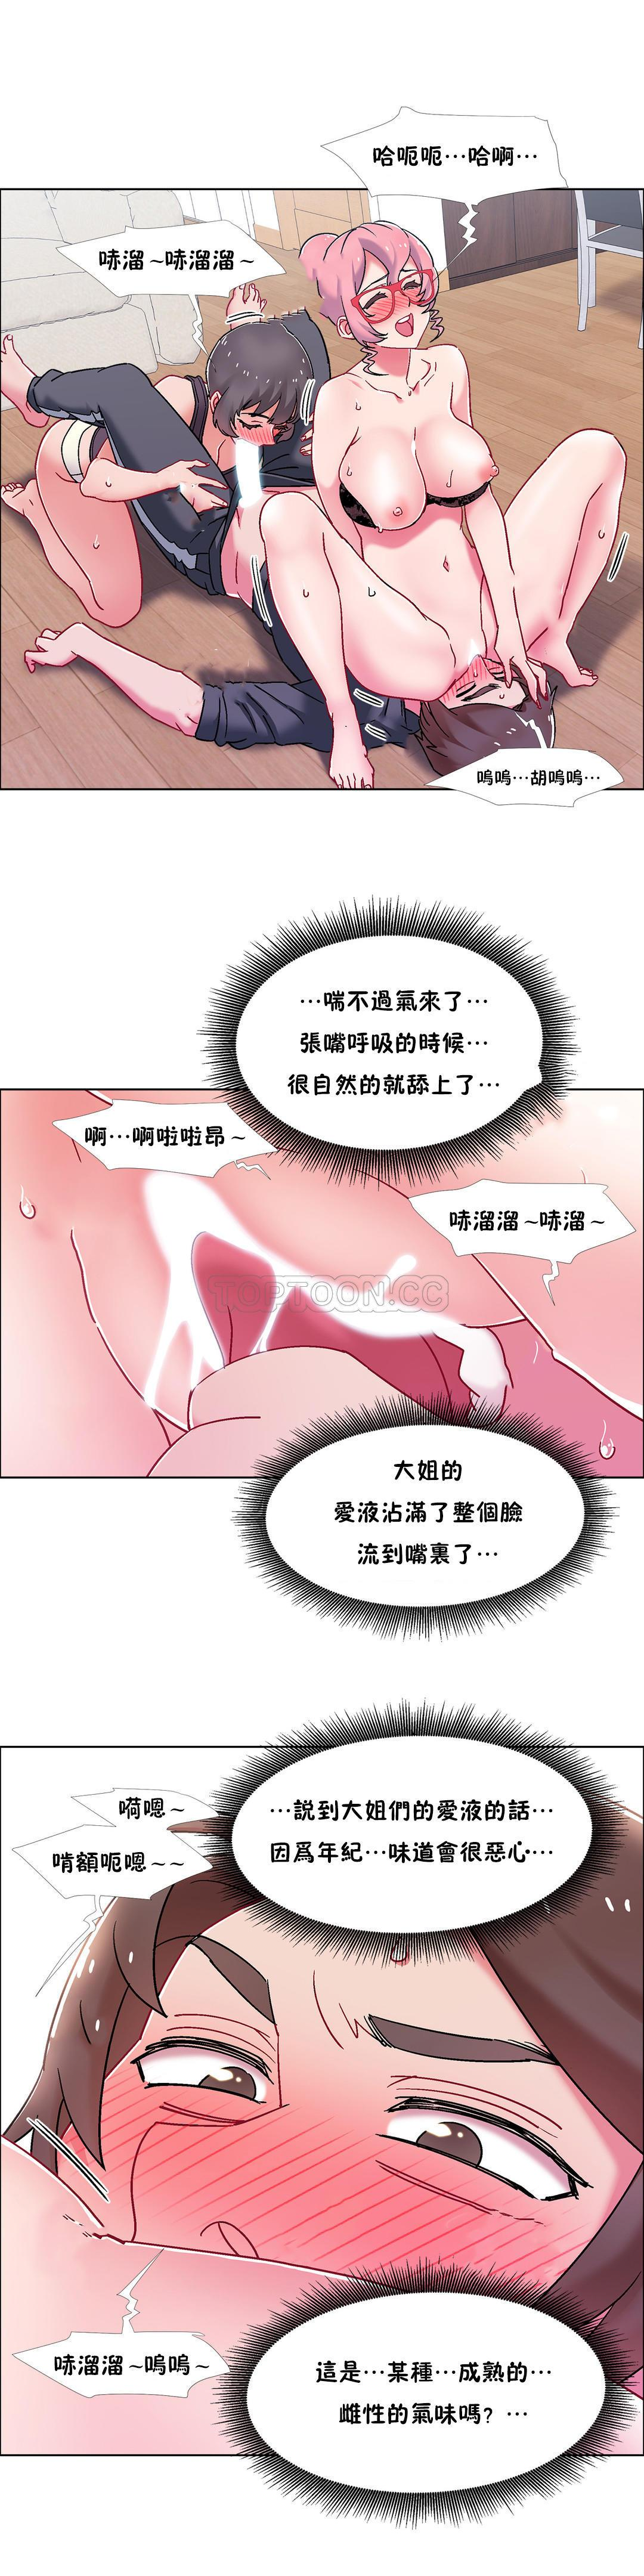 [Studio Wannabe] Rental Girls | 出租女郎 Ch. 33-58 [Chinese]  第二季 完结 355